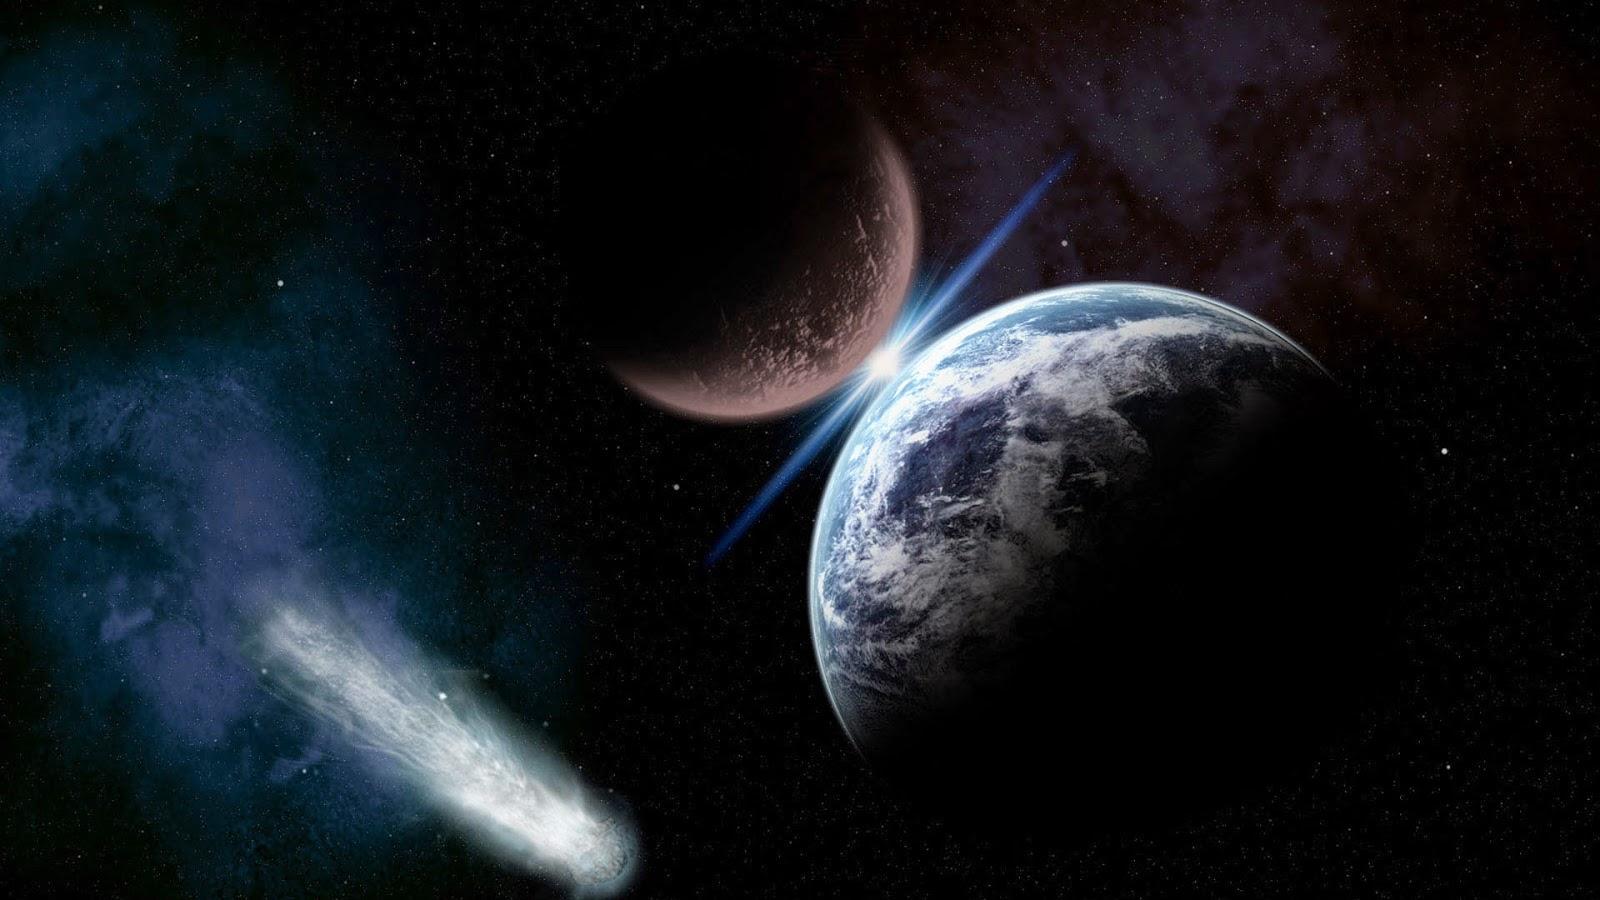 Planet vs Planet